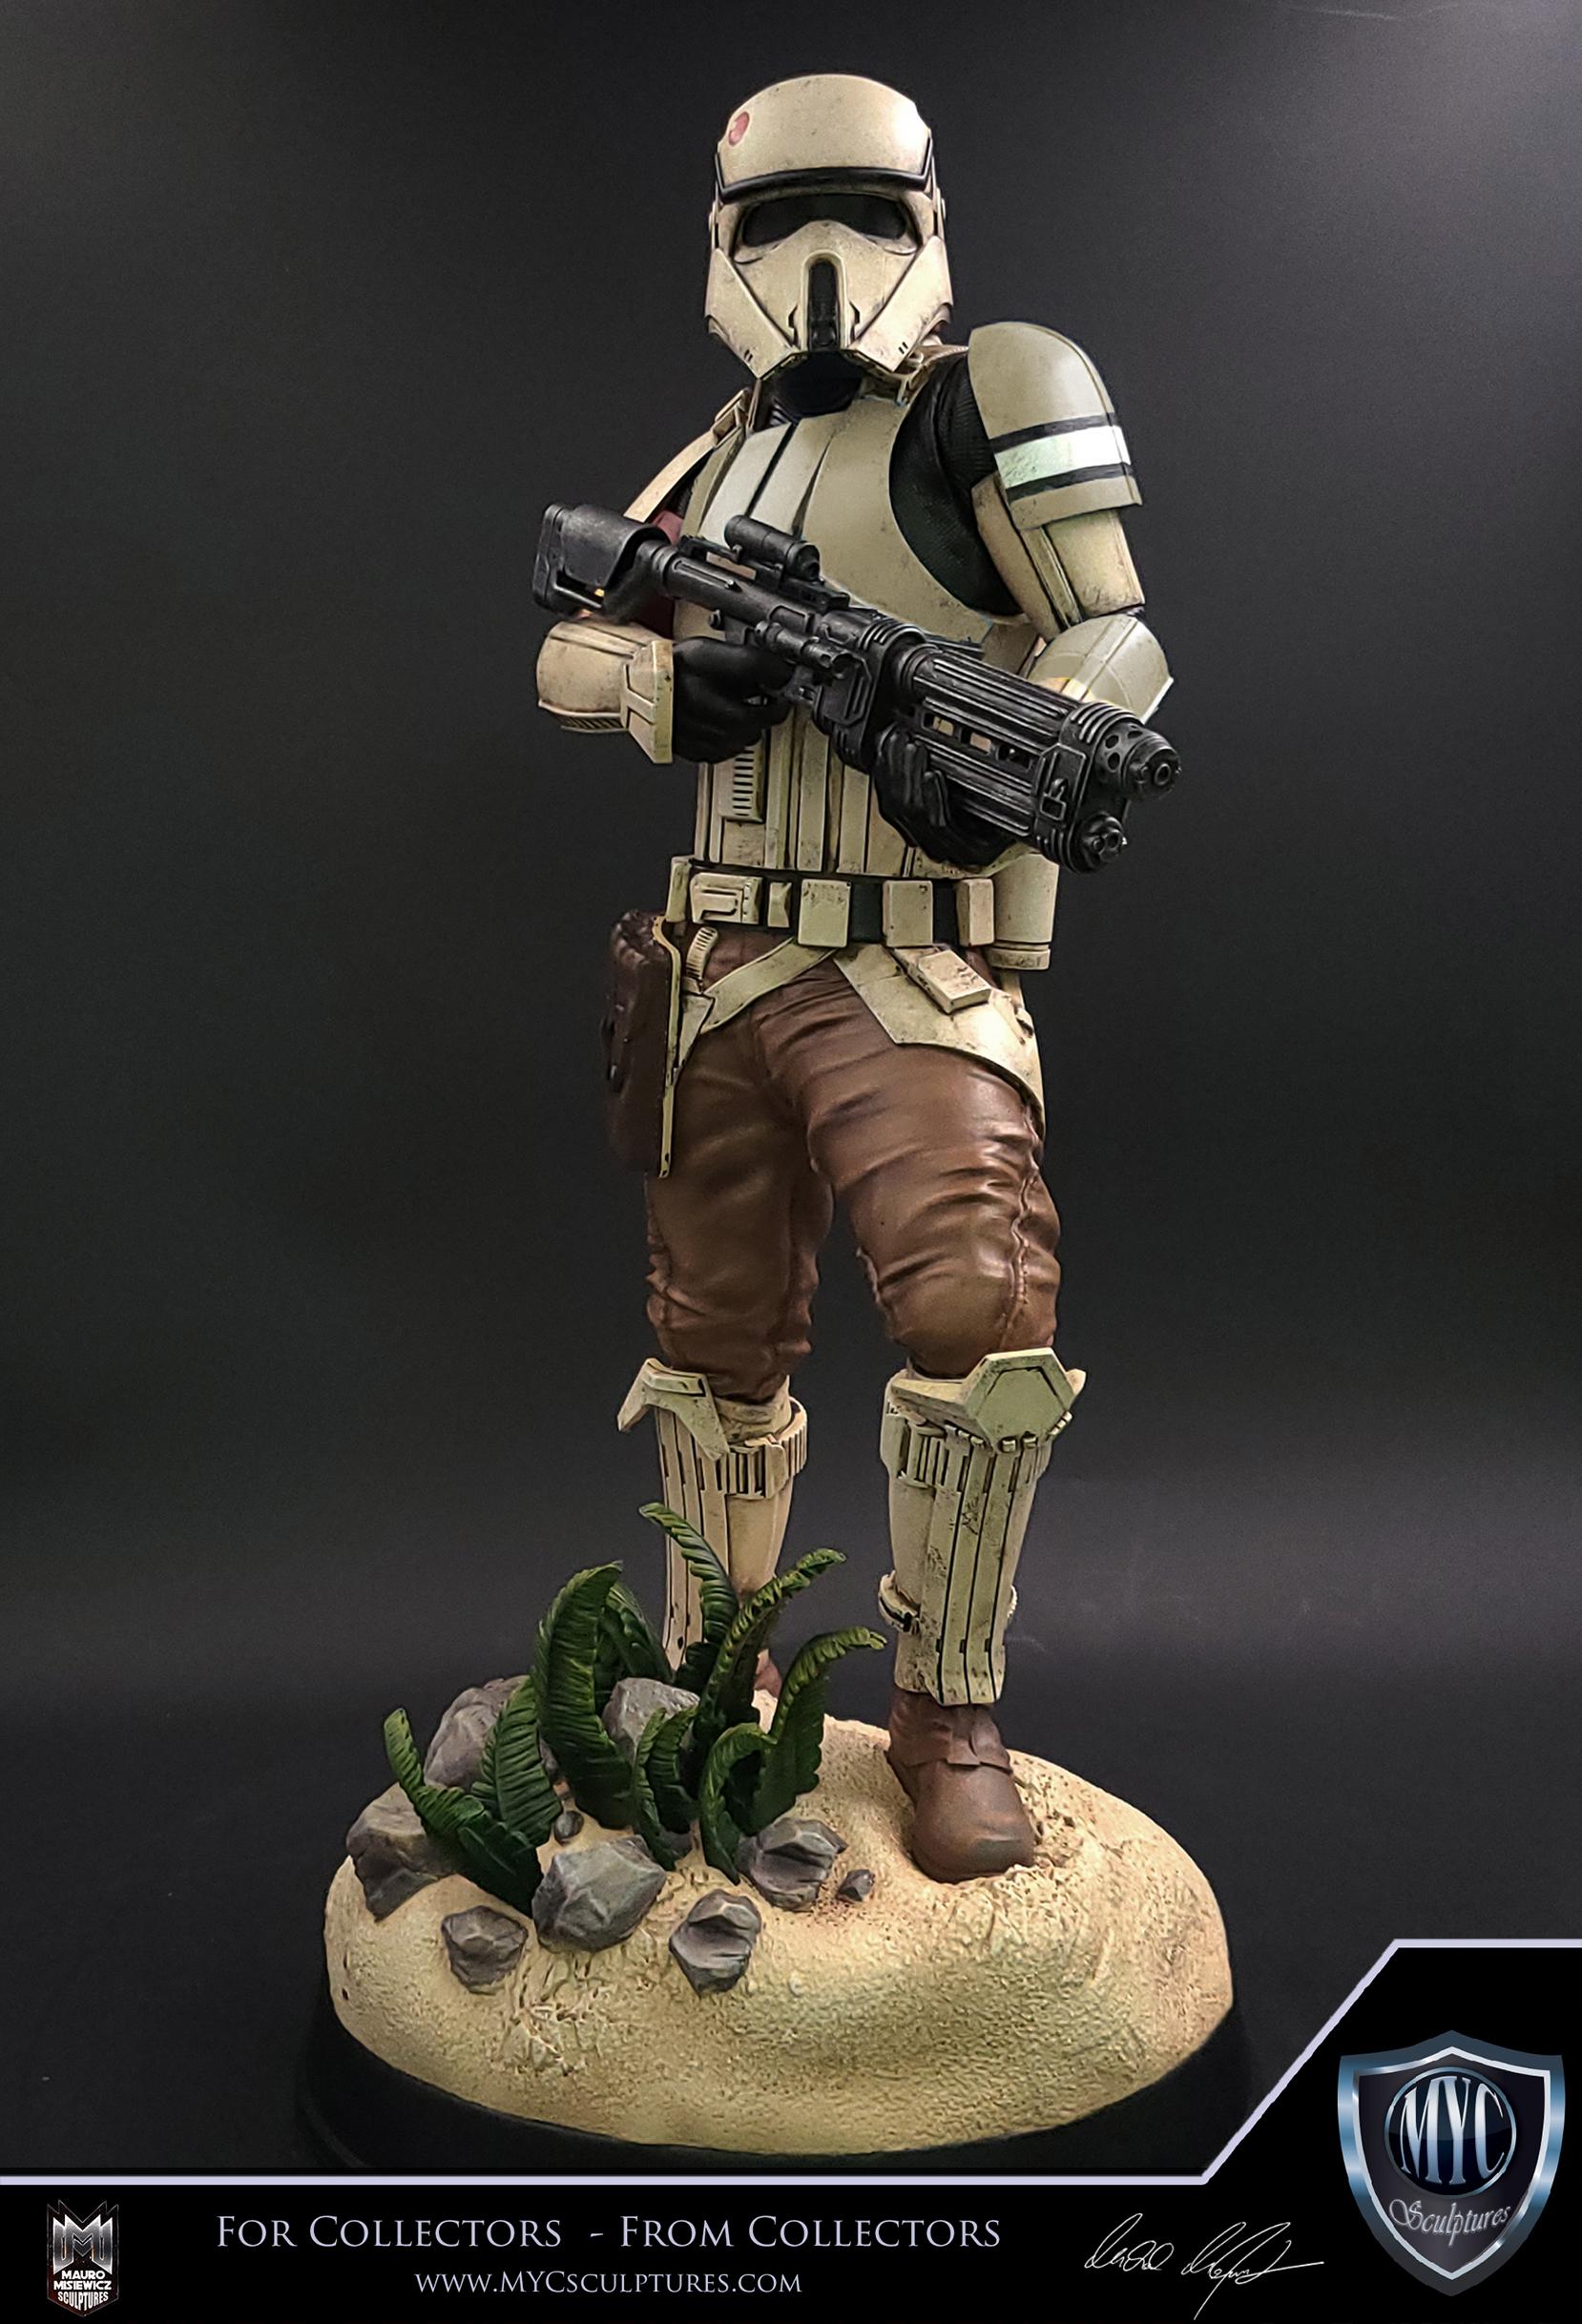 Grunt_Shoretrooper_MYC_Sculptures (2)